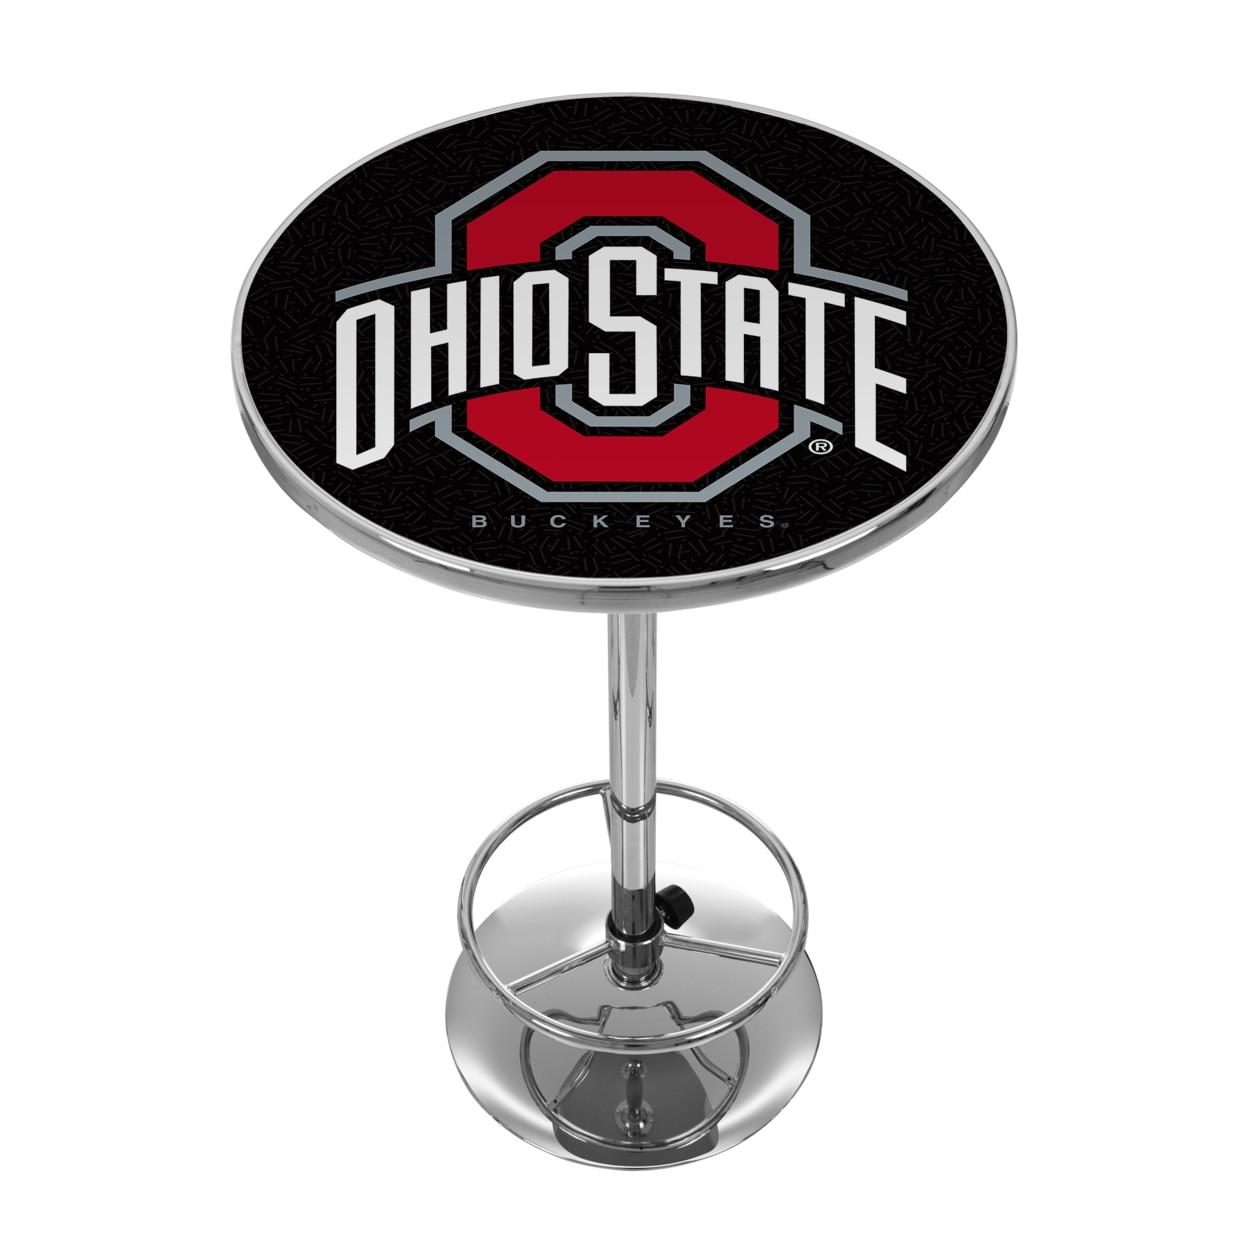 The Ohio State University 42 Inch Pub Table - Black winesburg ohio